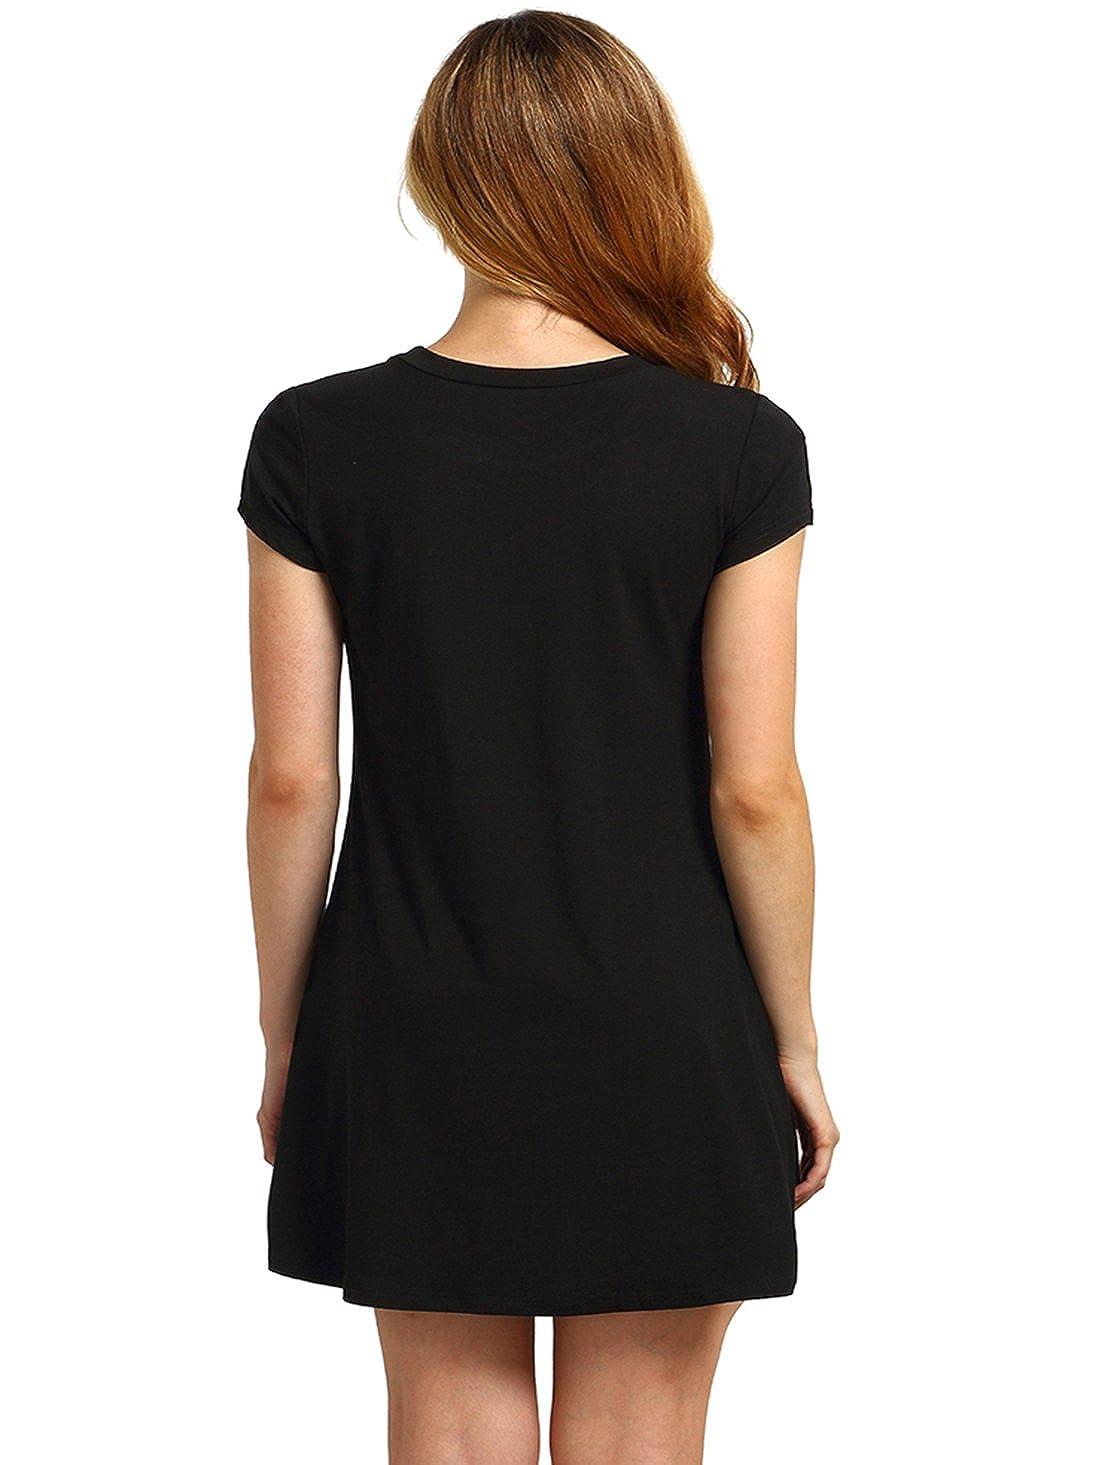 6b5ba899858 Romwe Women's Short Sleeve Shirt Casual Swing Dress at Amazon Women's  Clothing store: